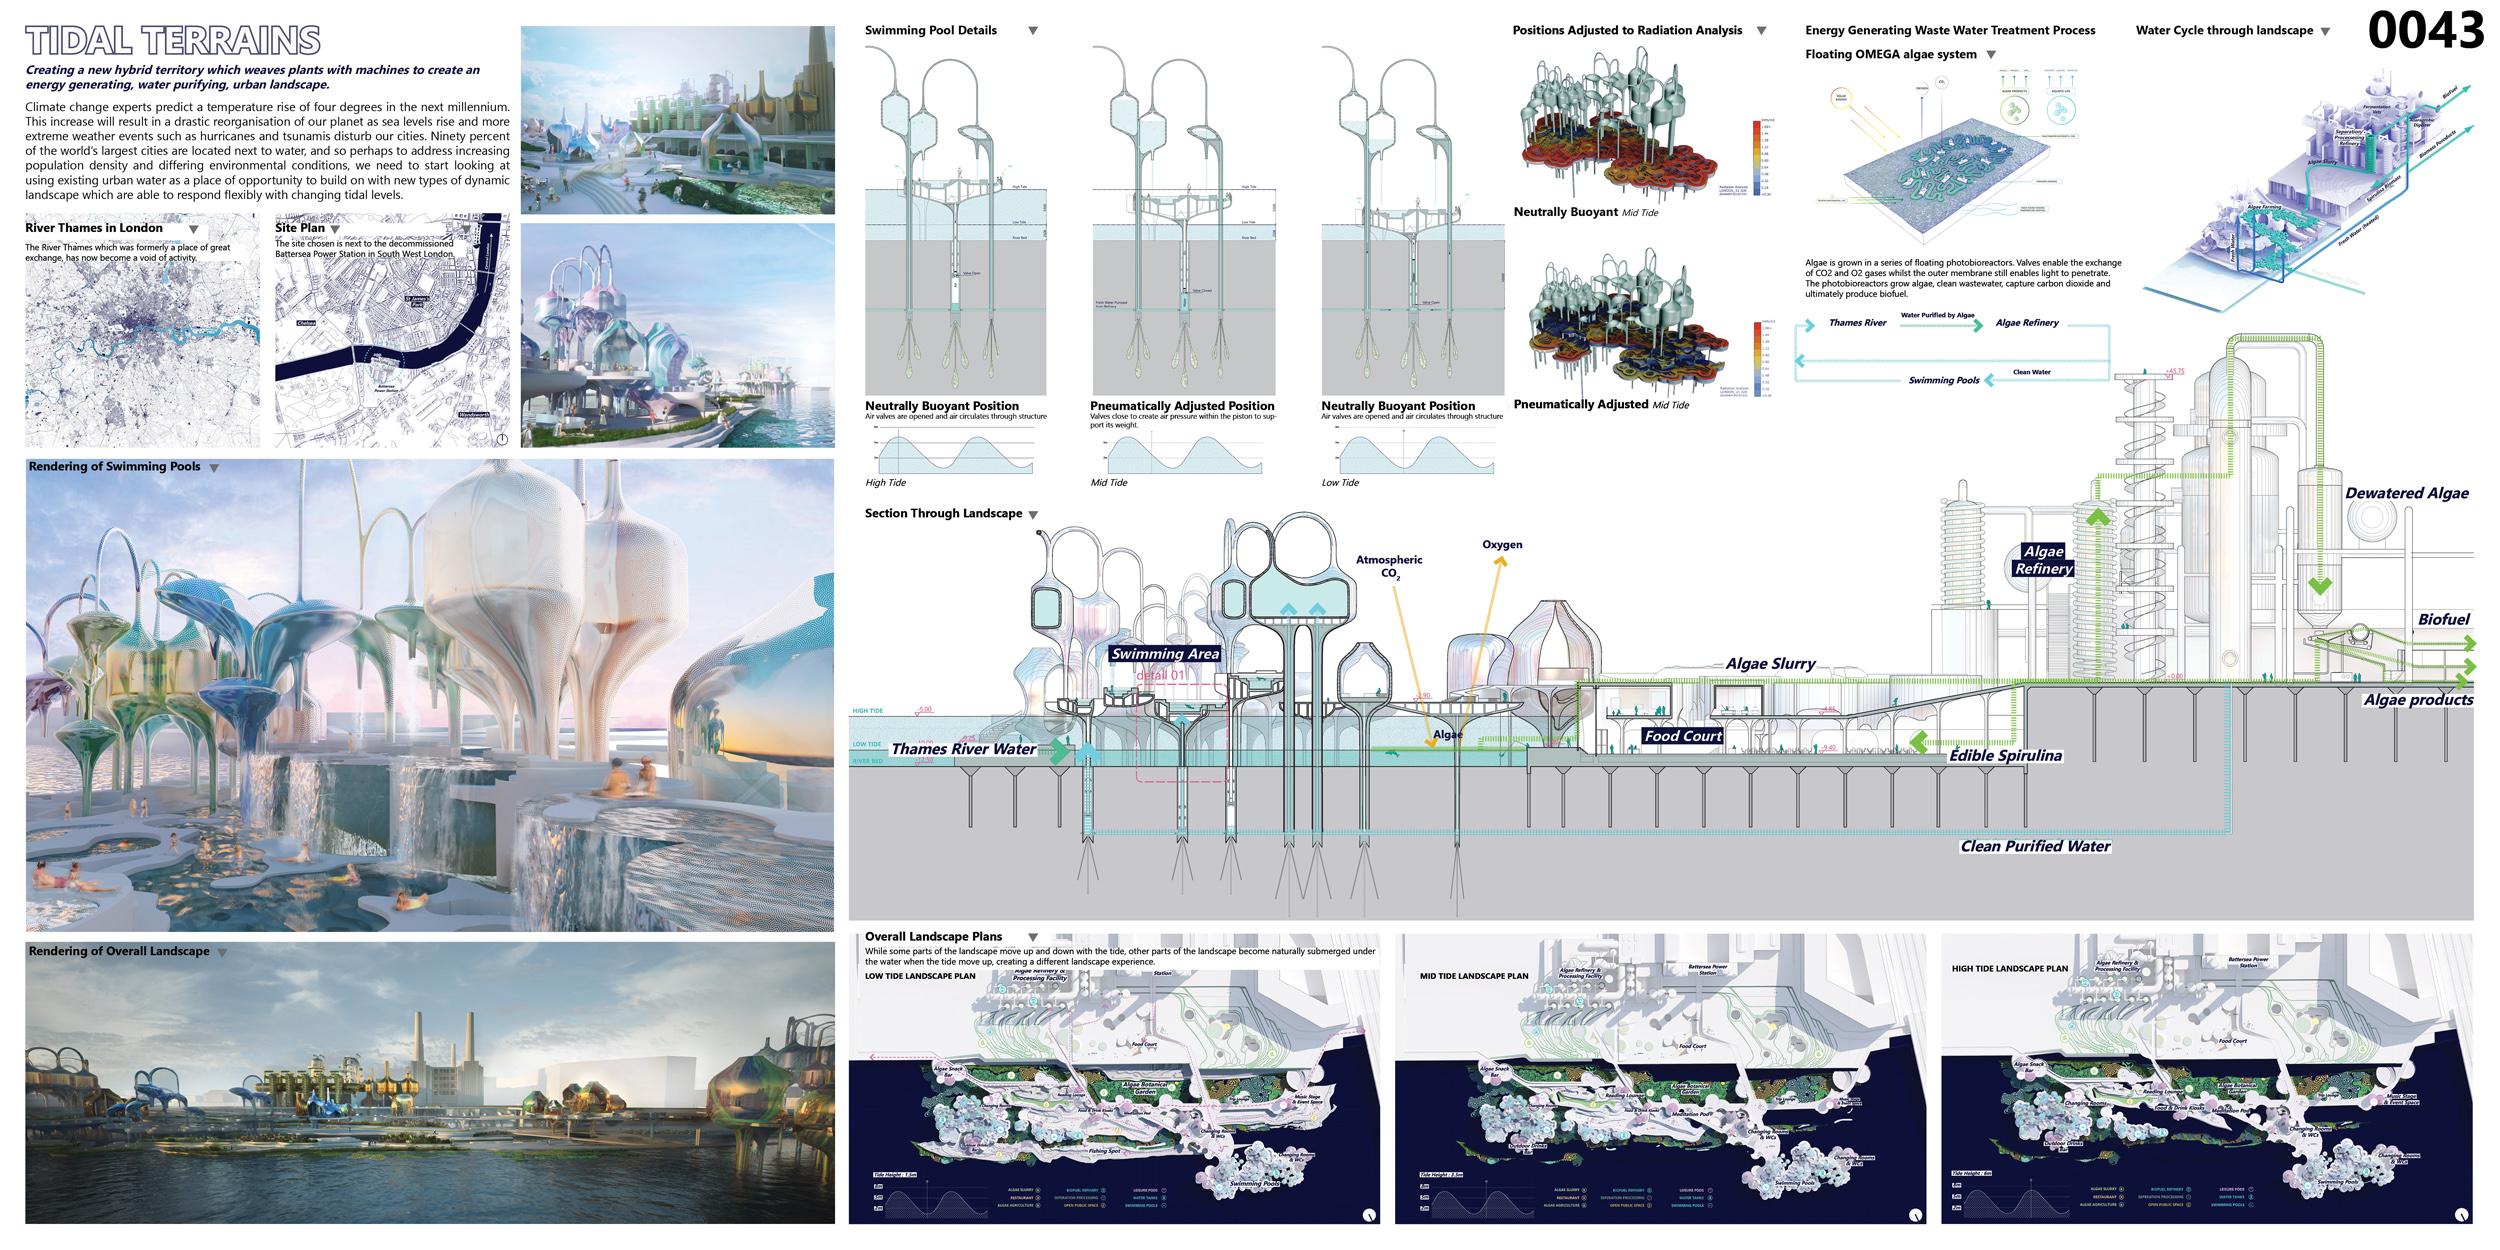 arquitetura-do-futuro-04